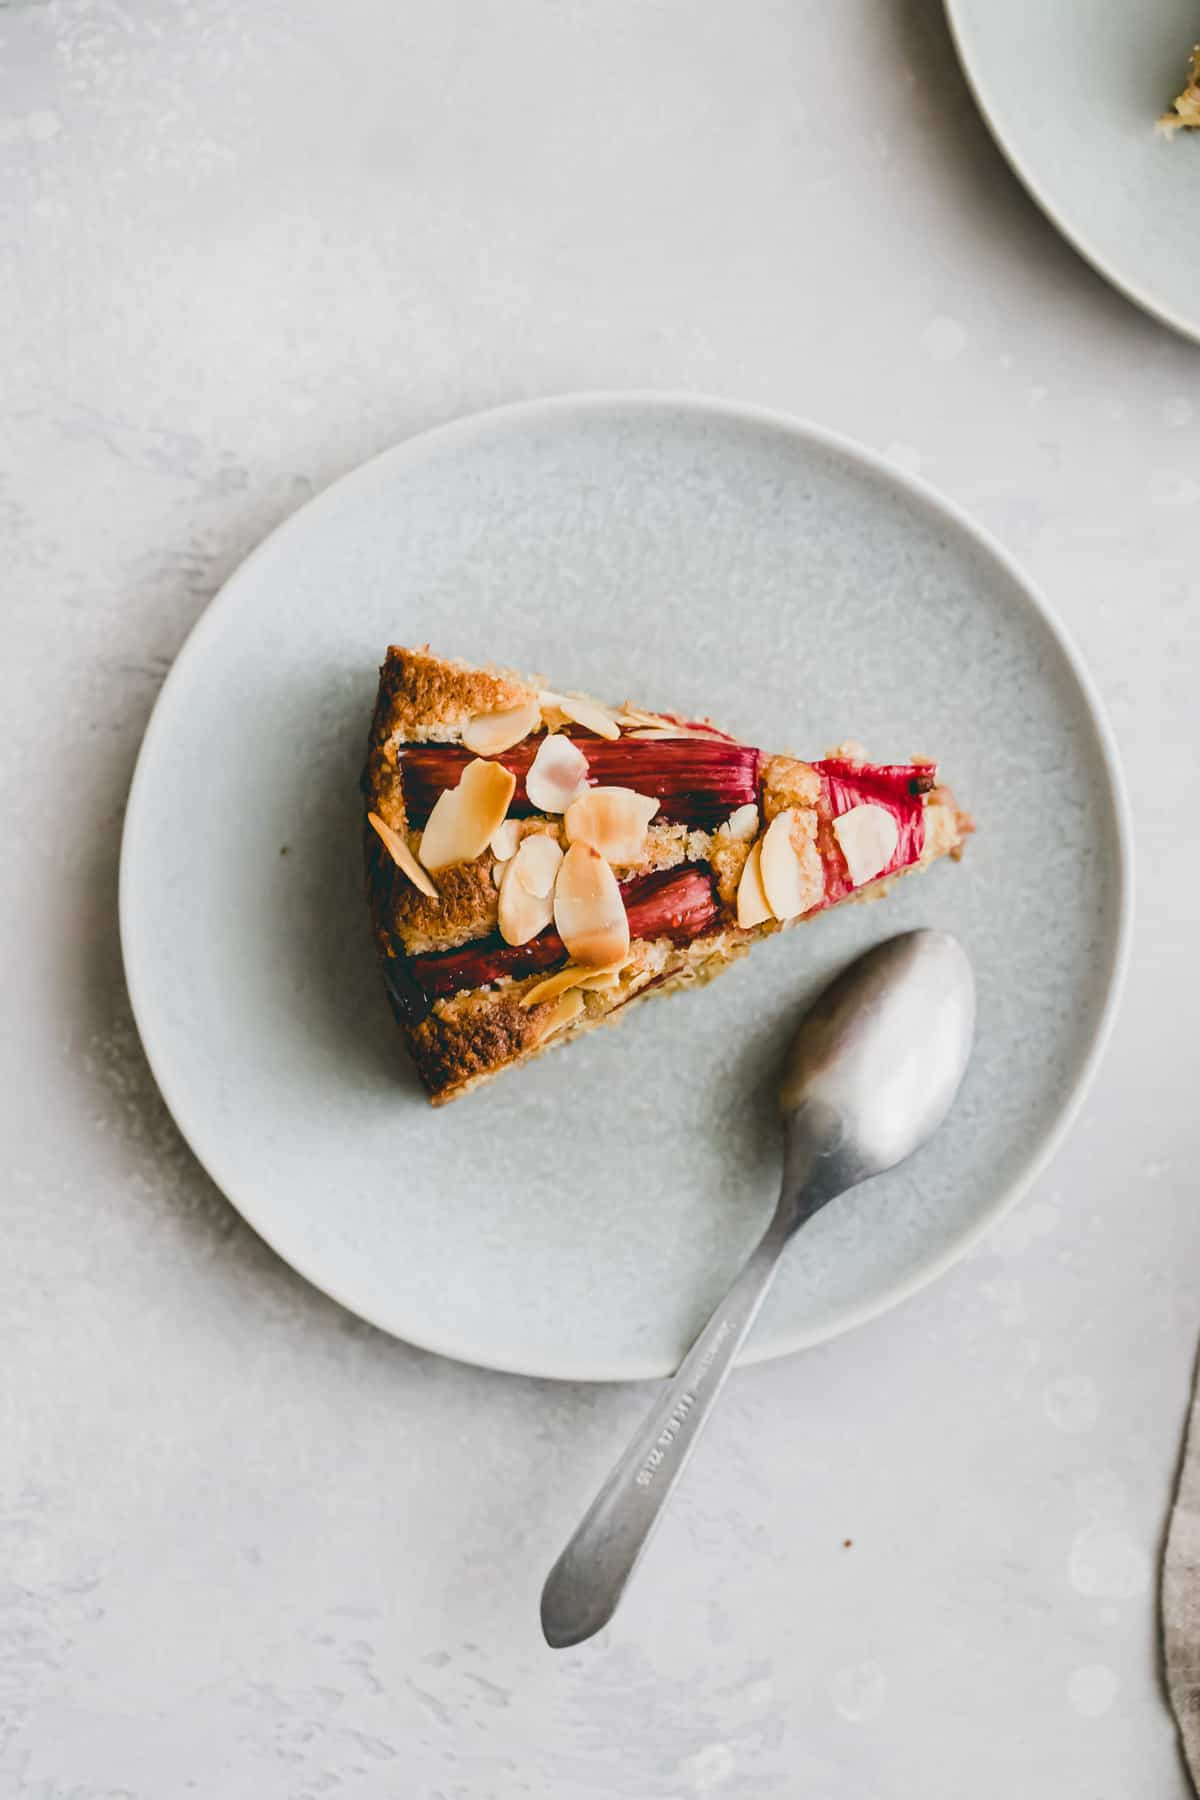 a slice of rhubarb almond cake on a blue plate